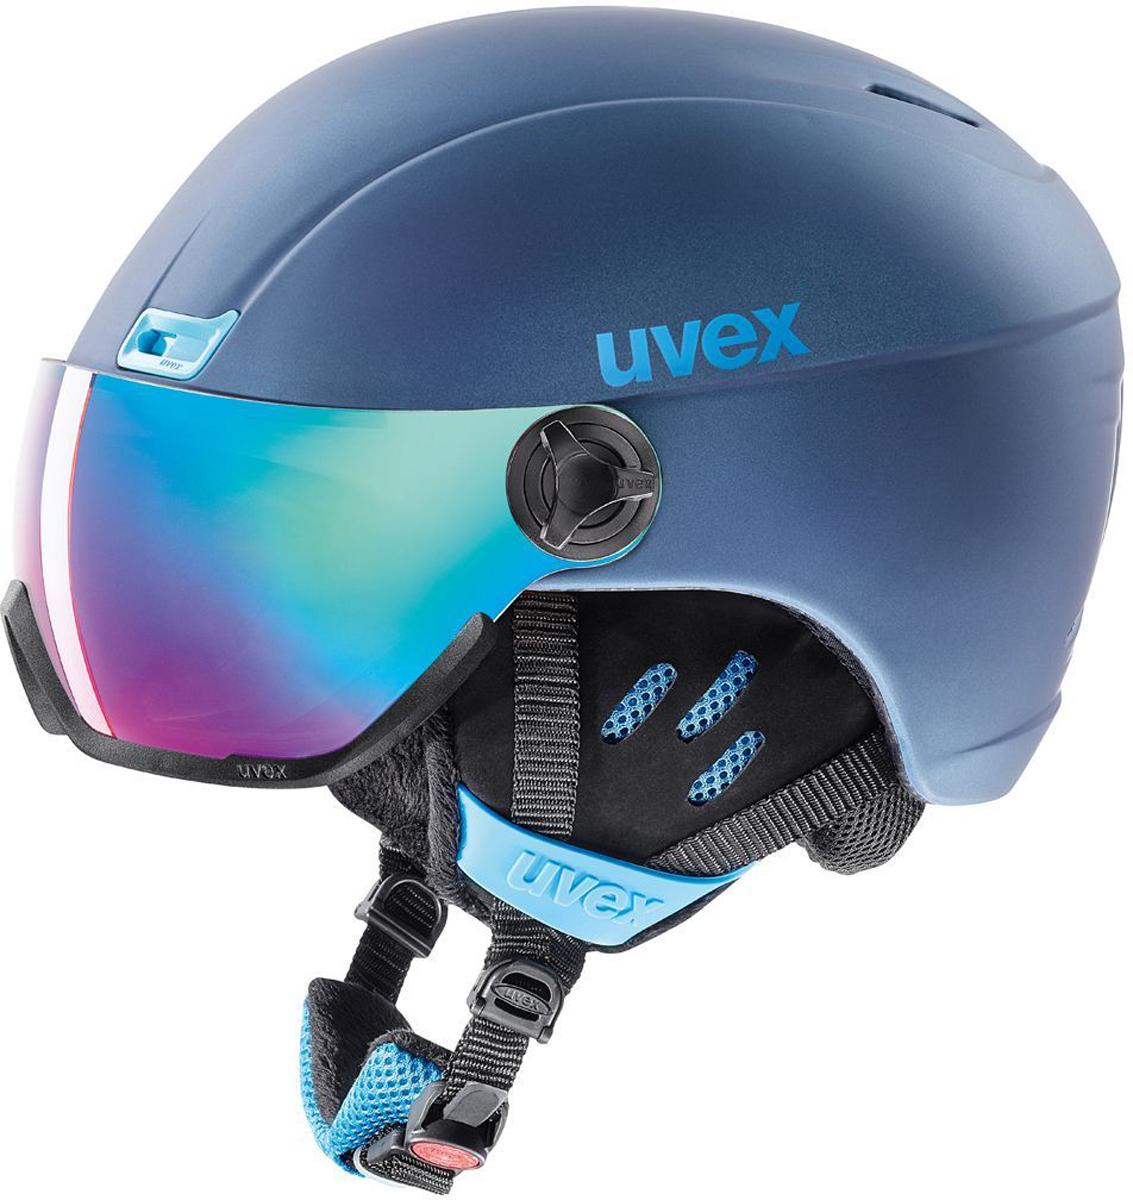 Шлем горнолыжный Uvex 400 Visor Style, цвет: синий. Размер 53-58